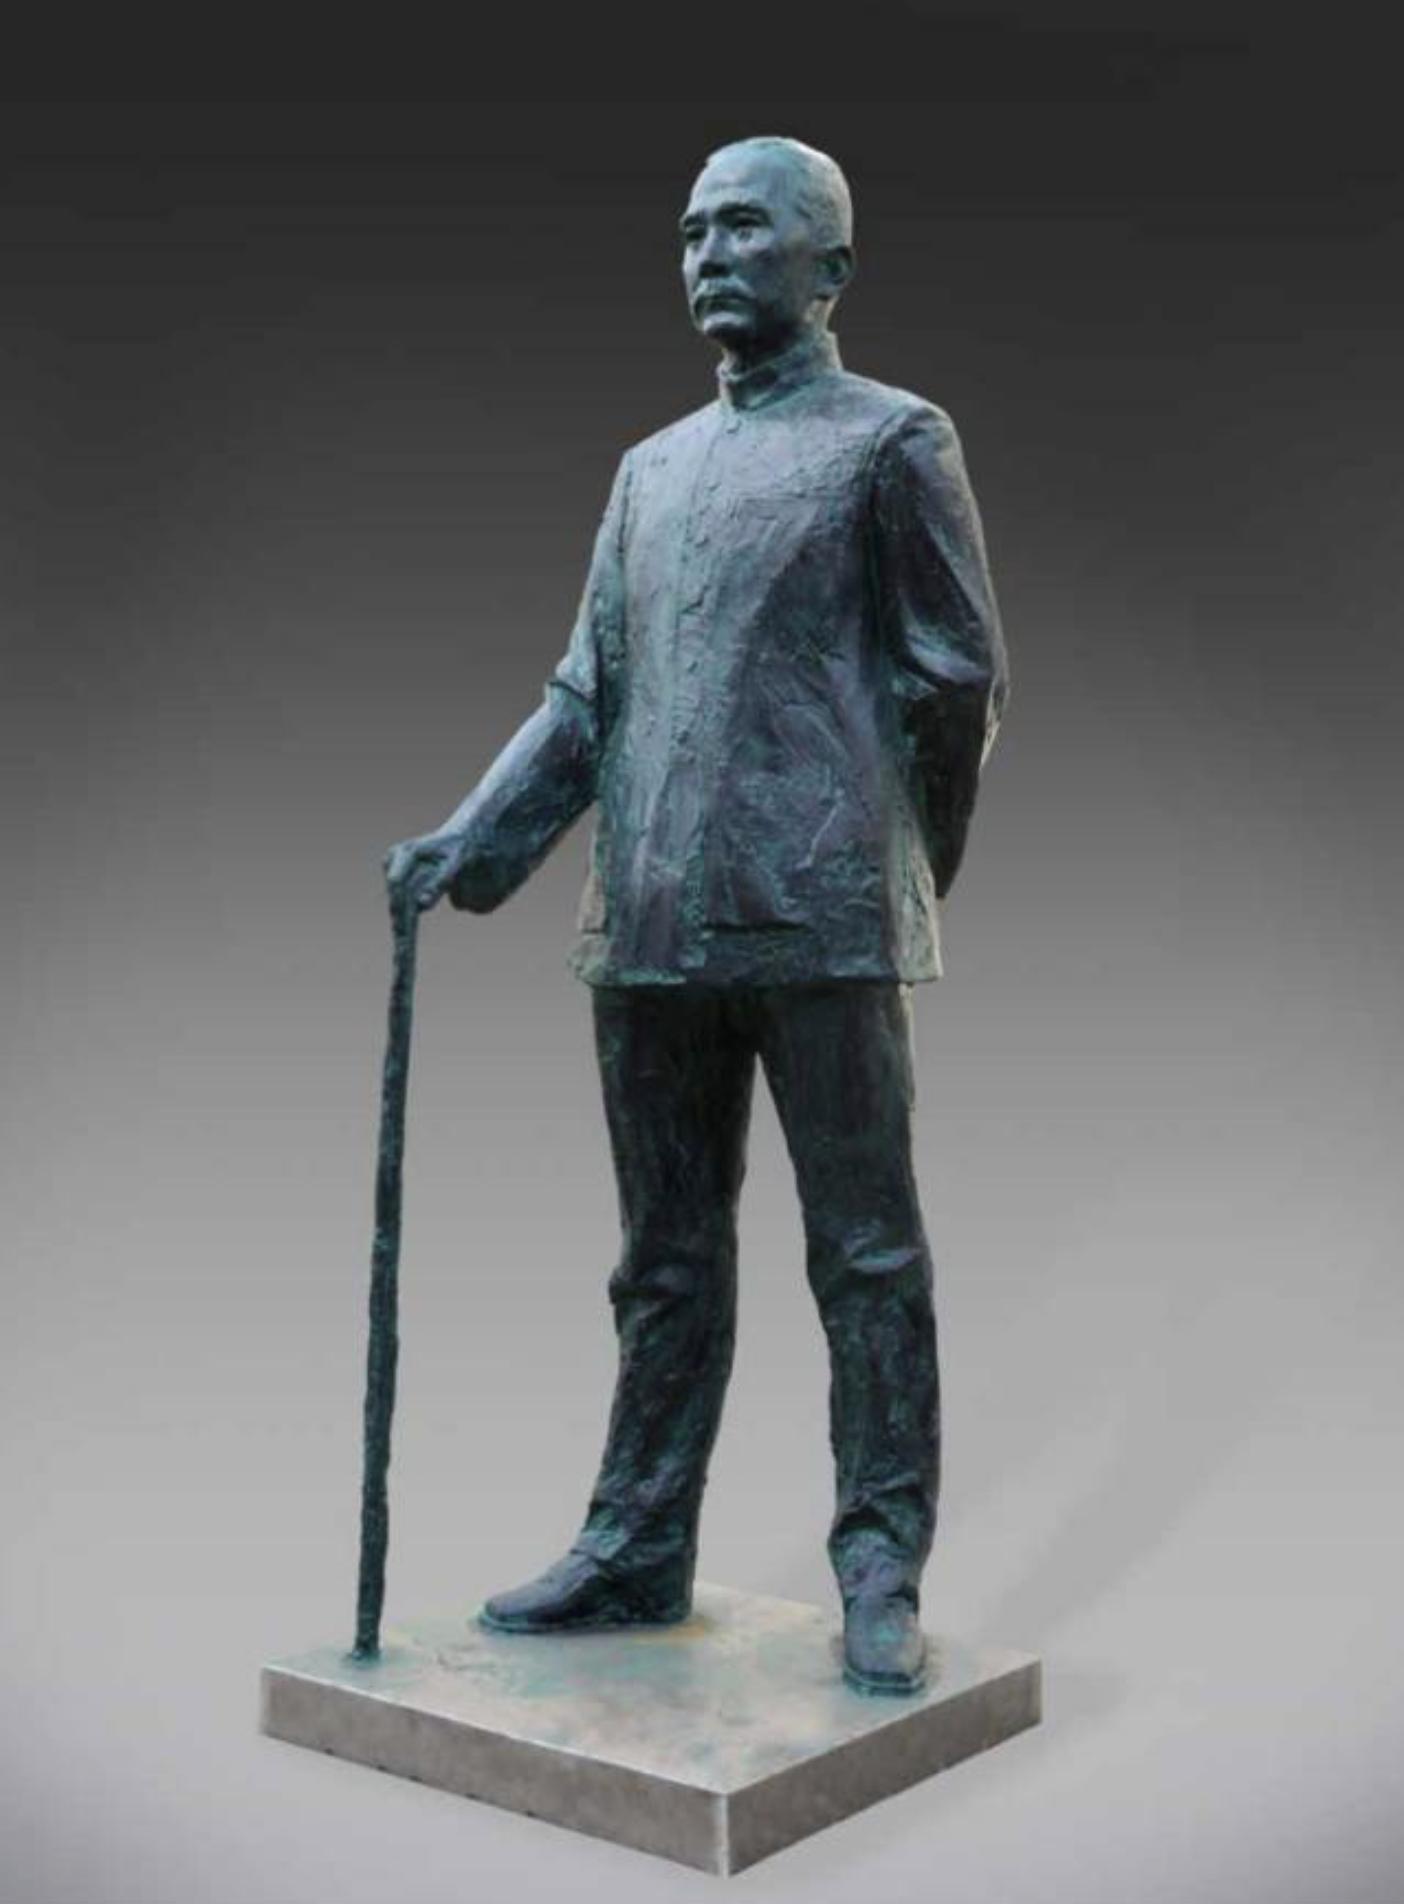 《孫中山像》 鑄銅 高230cm 2002年.png